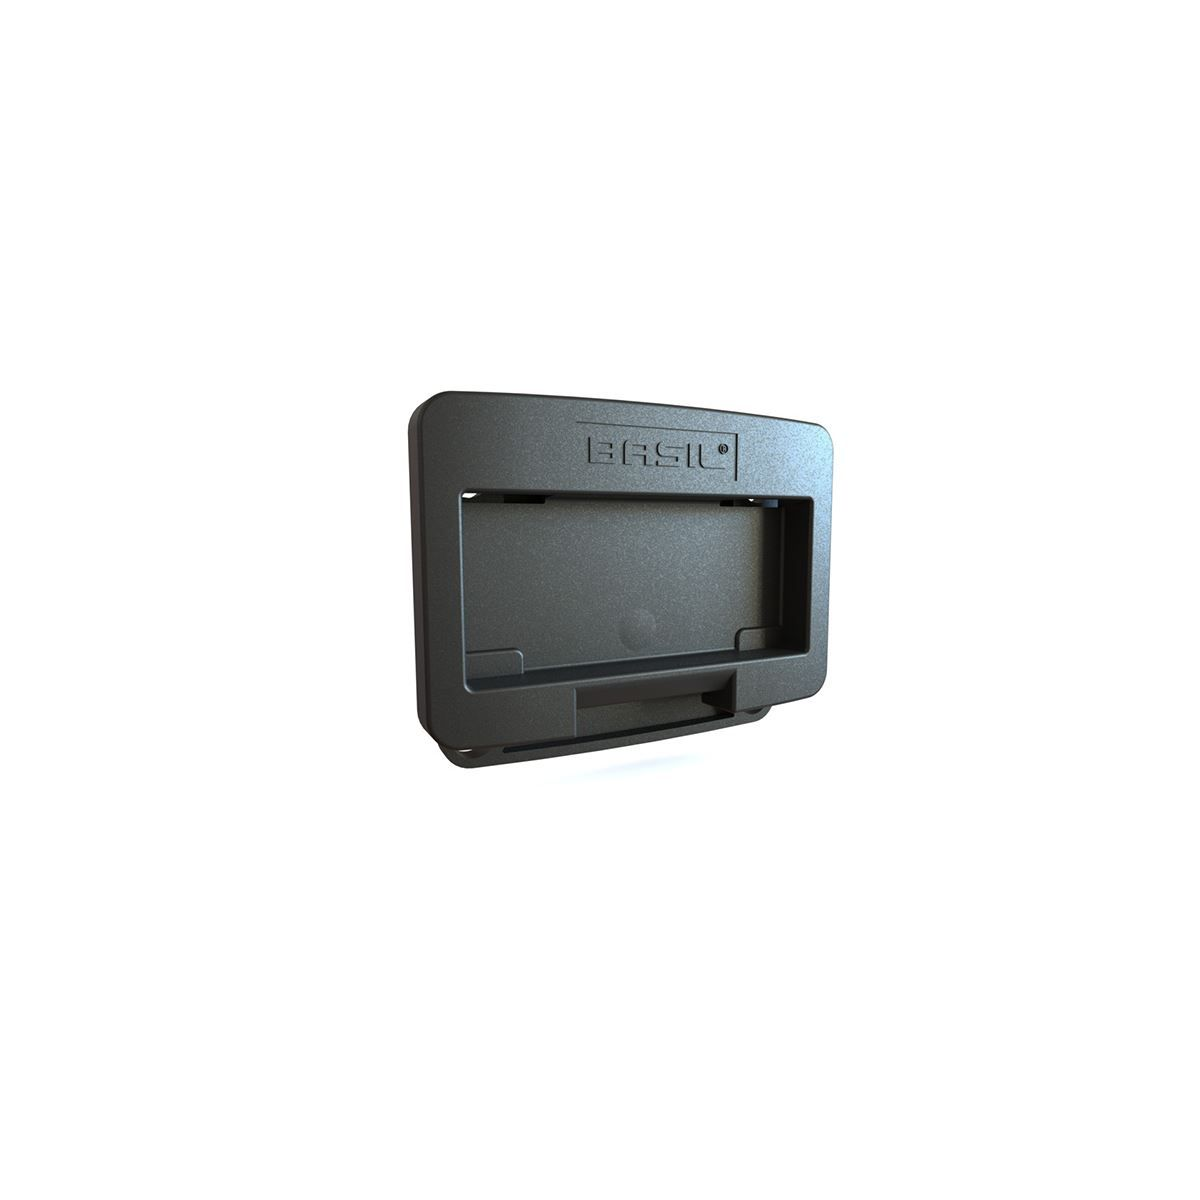 Basil Klickfix-System Adapter Plate Black: Black